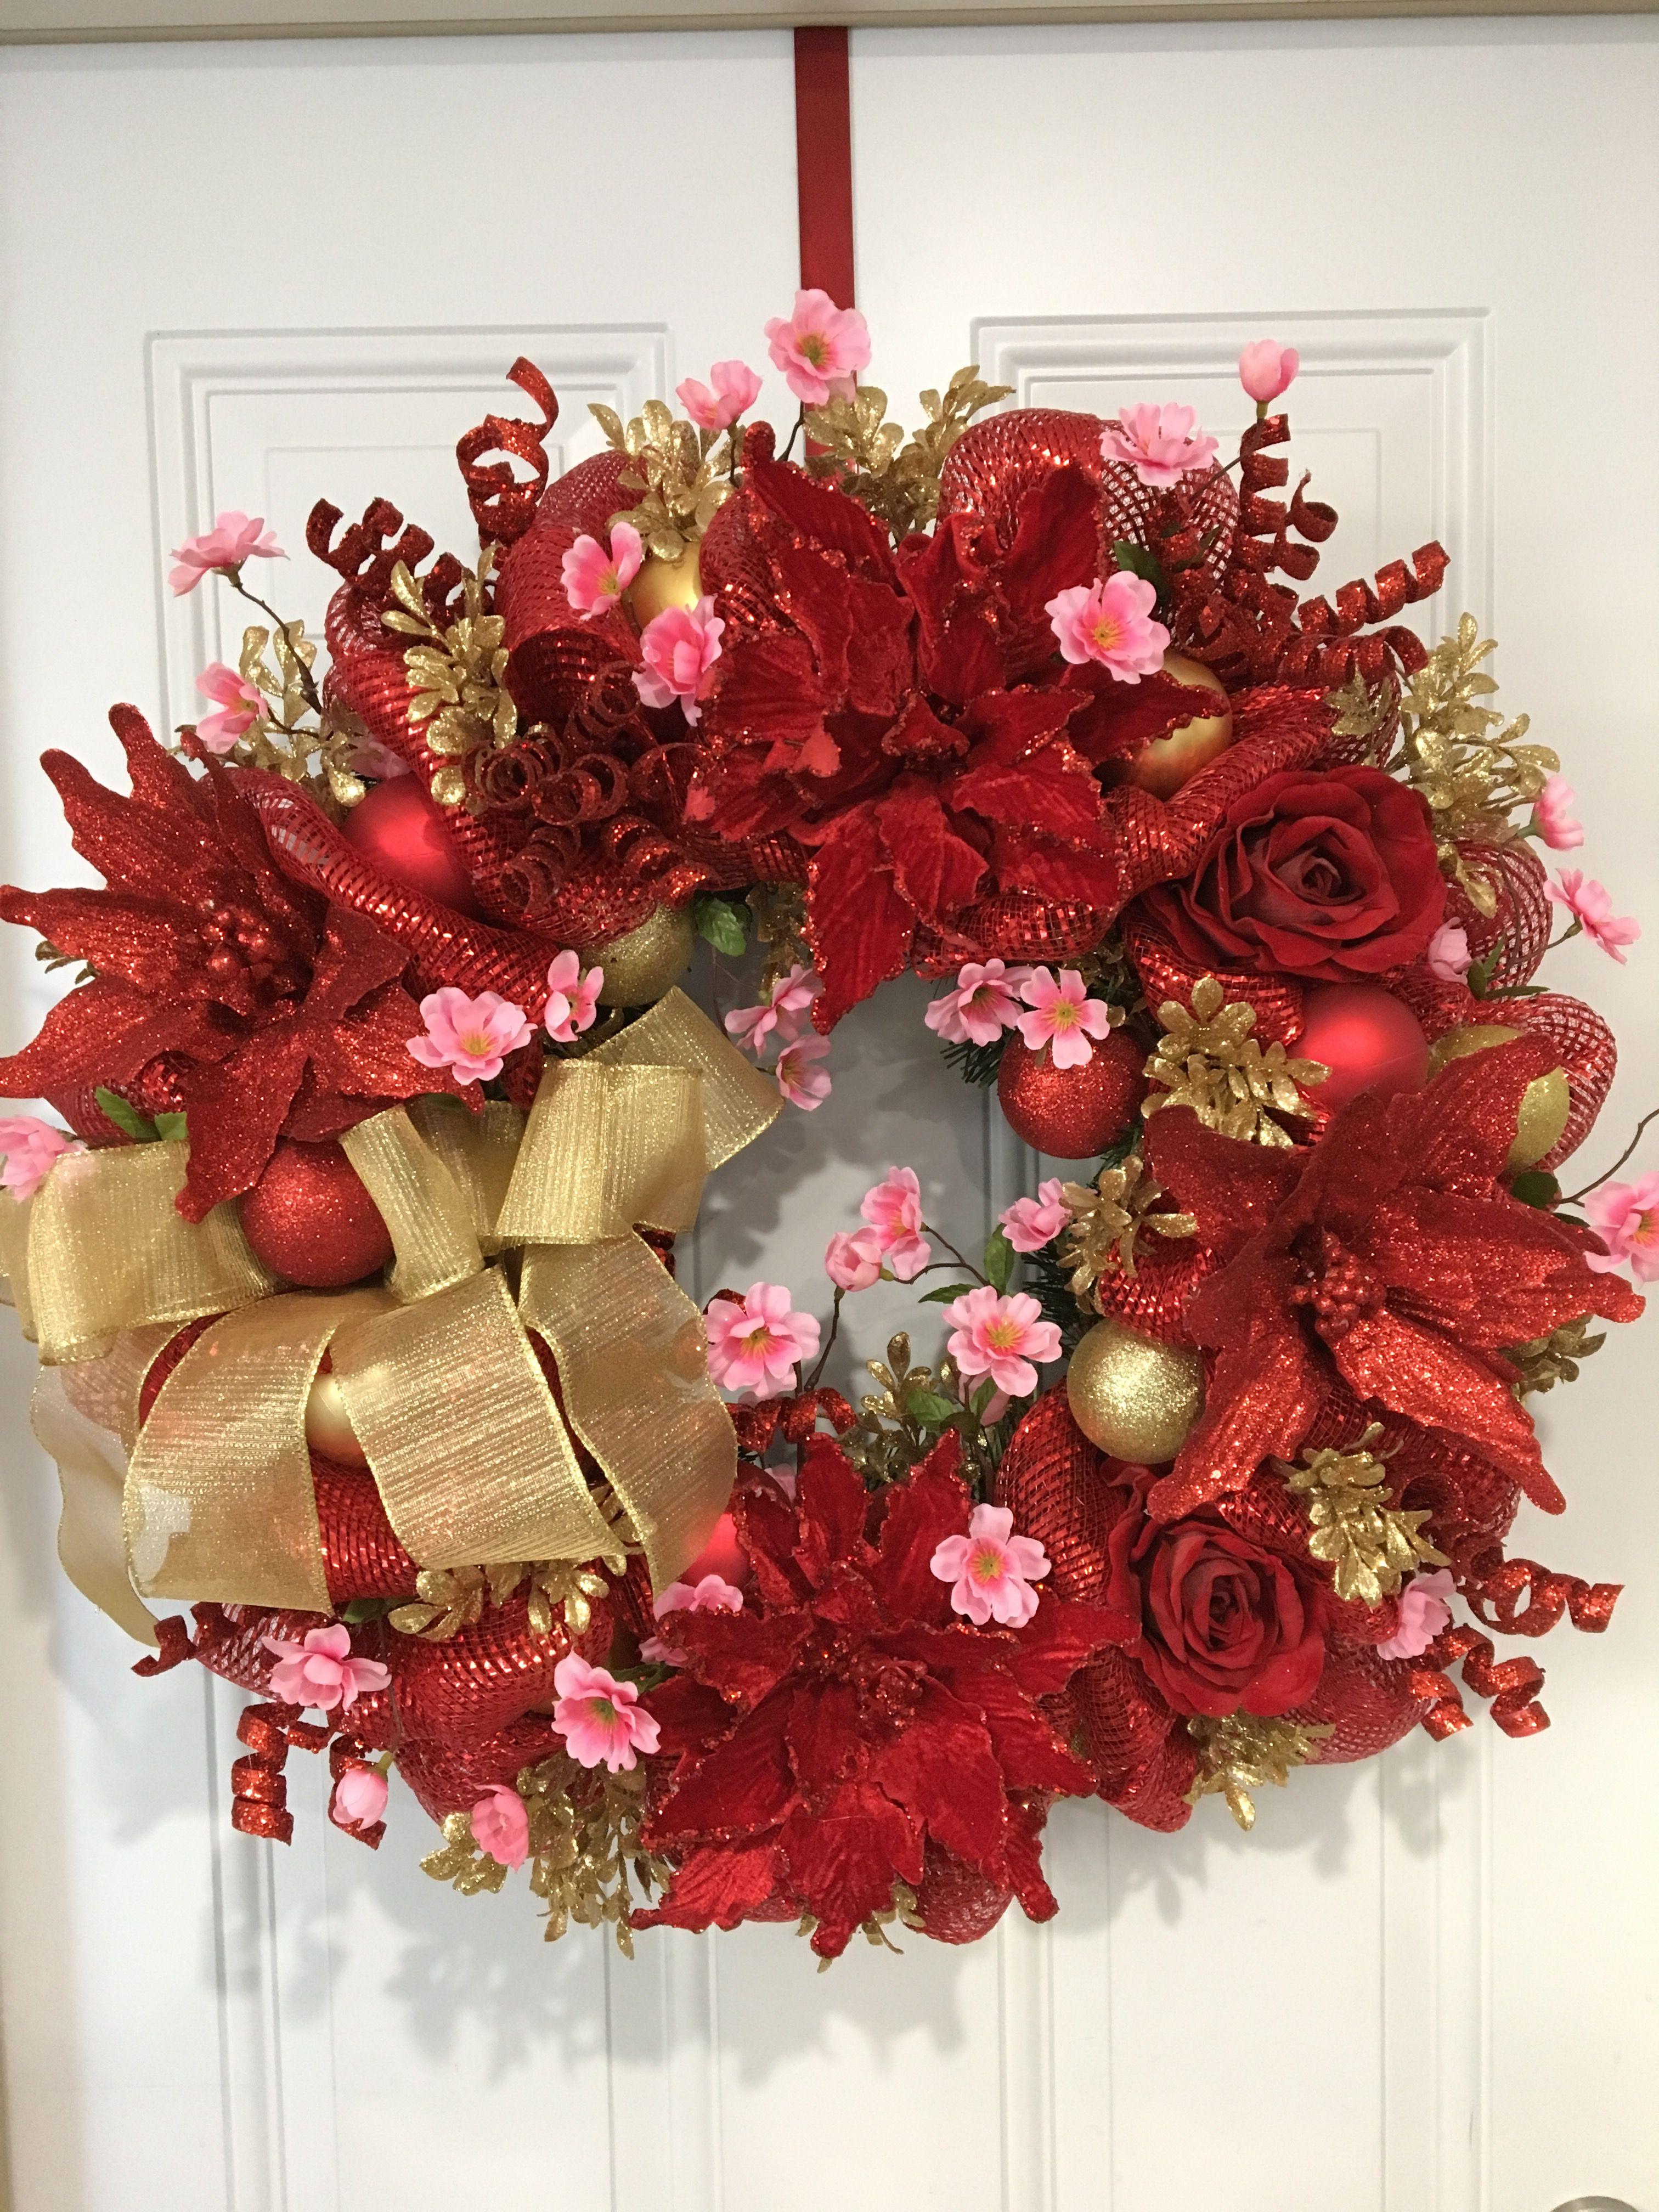 Chinese New Year wreath Christmas wreaths diy, Asian